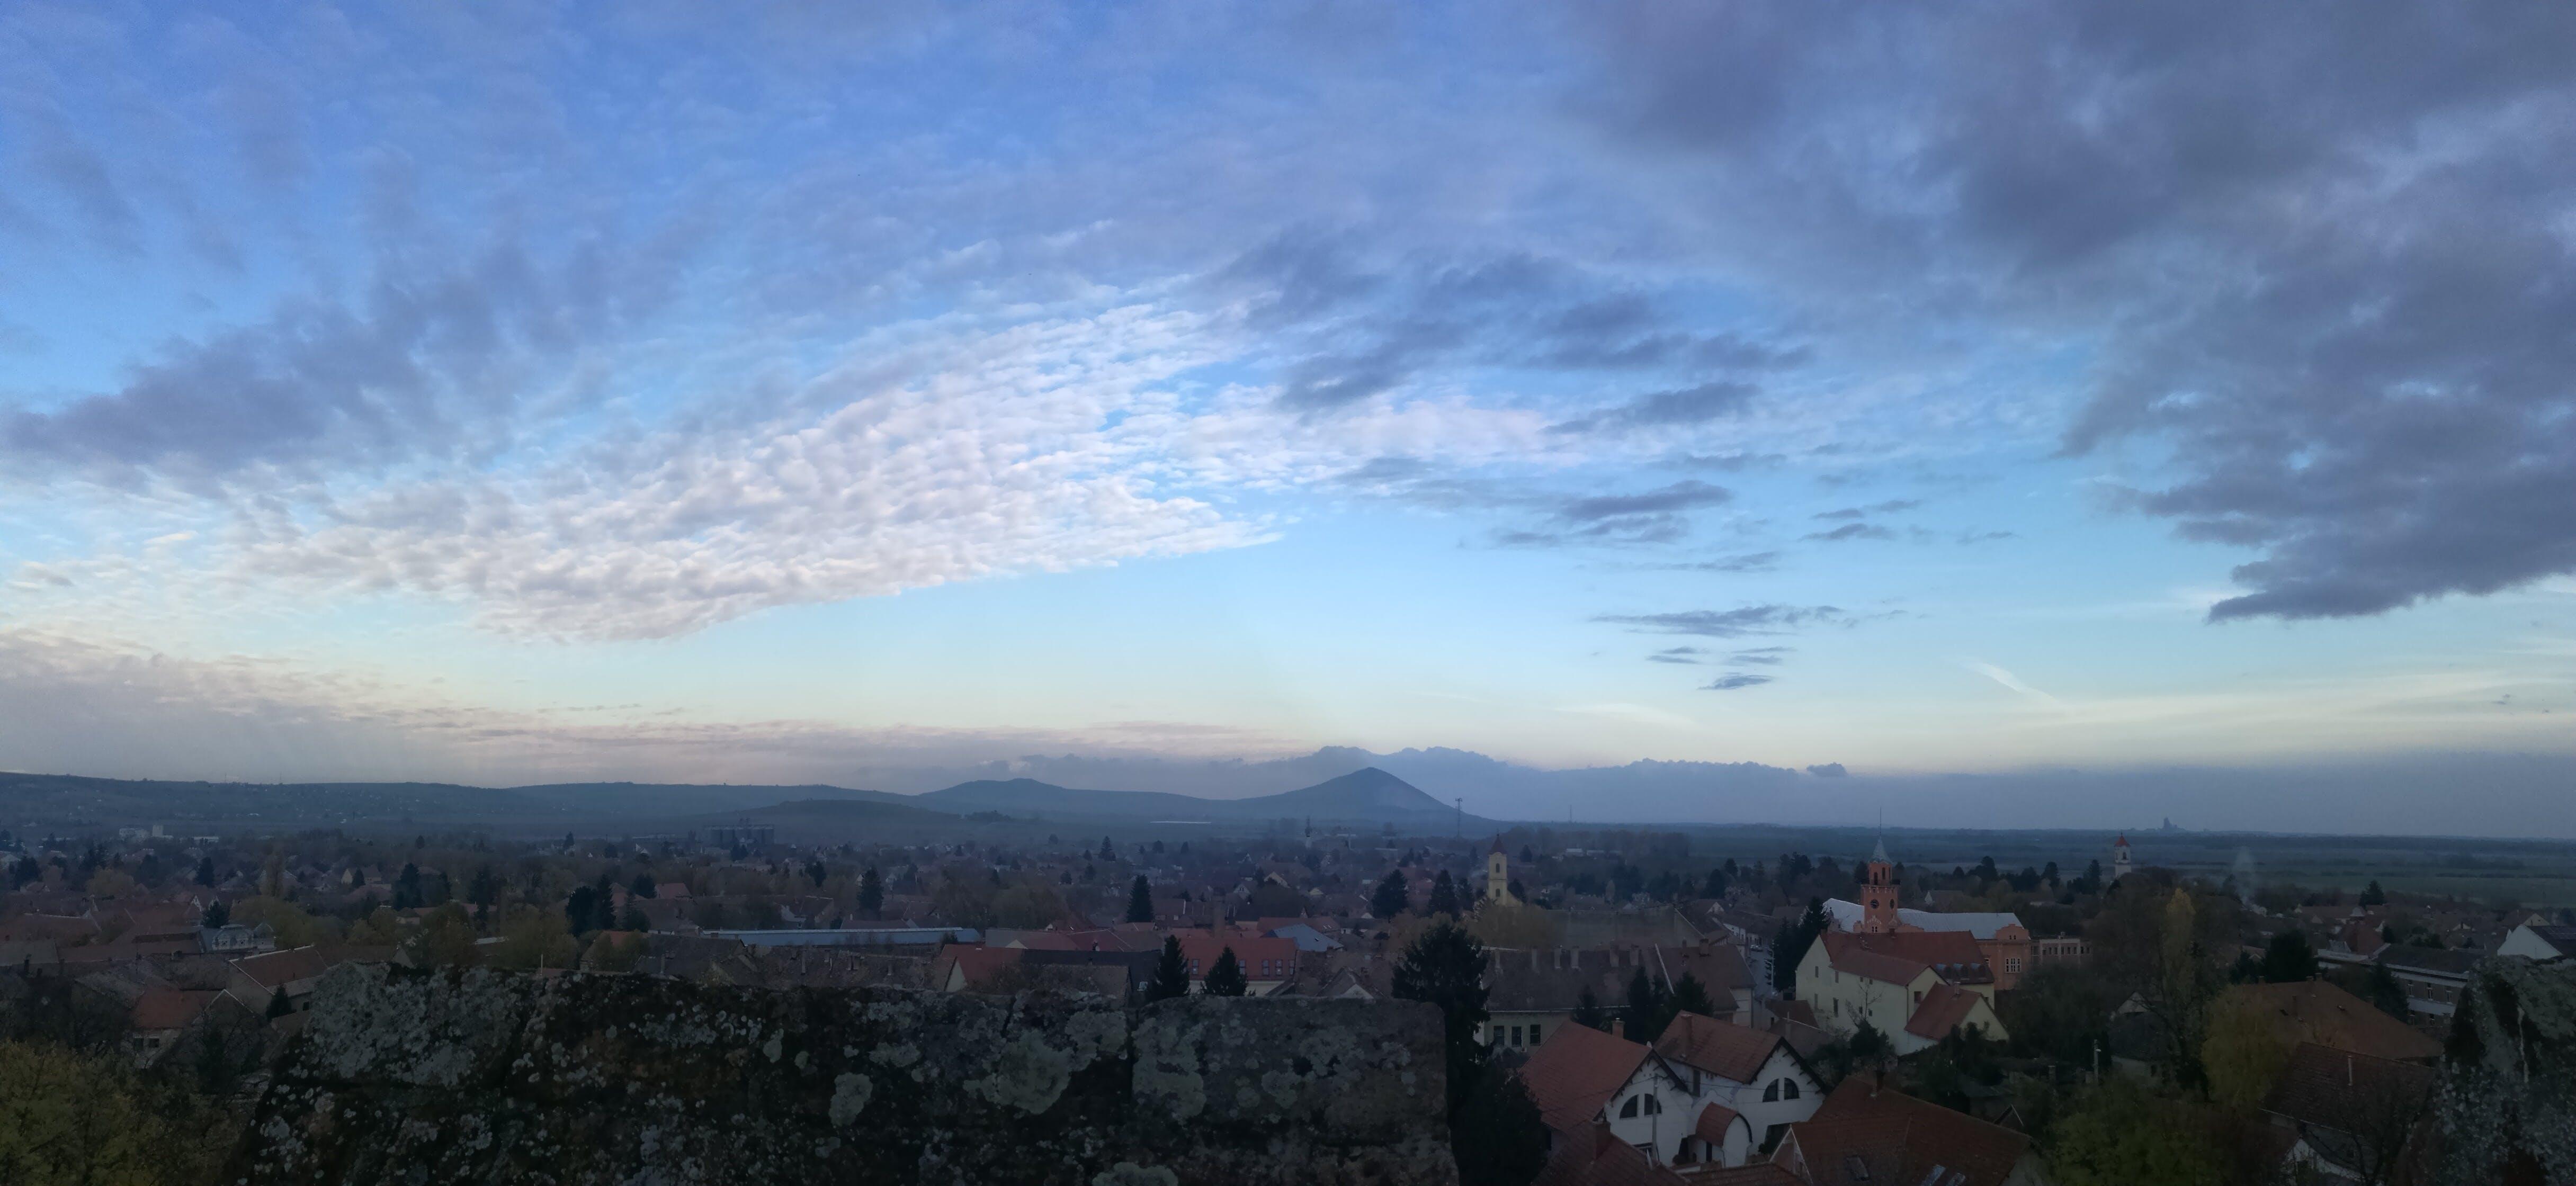 Kostenloses Stock Foto zu himmel, landschaft